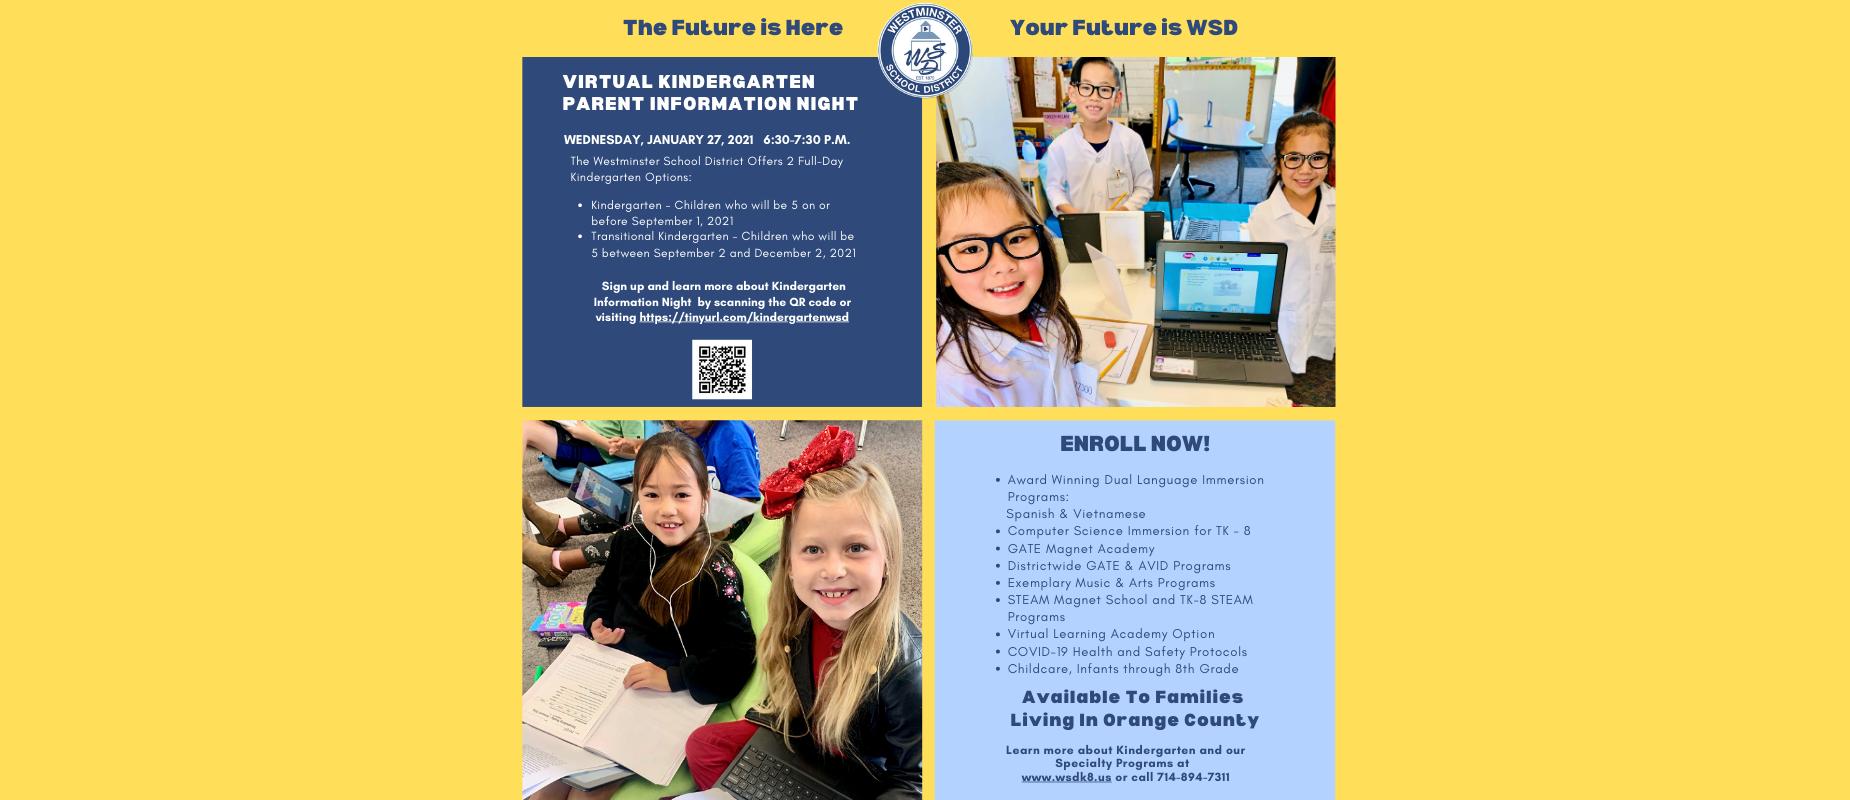 Virtual Kindergarten Parent Information Night Wednesday January 27, 2021